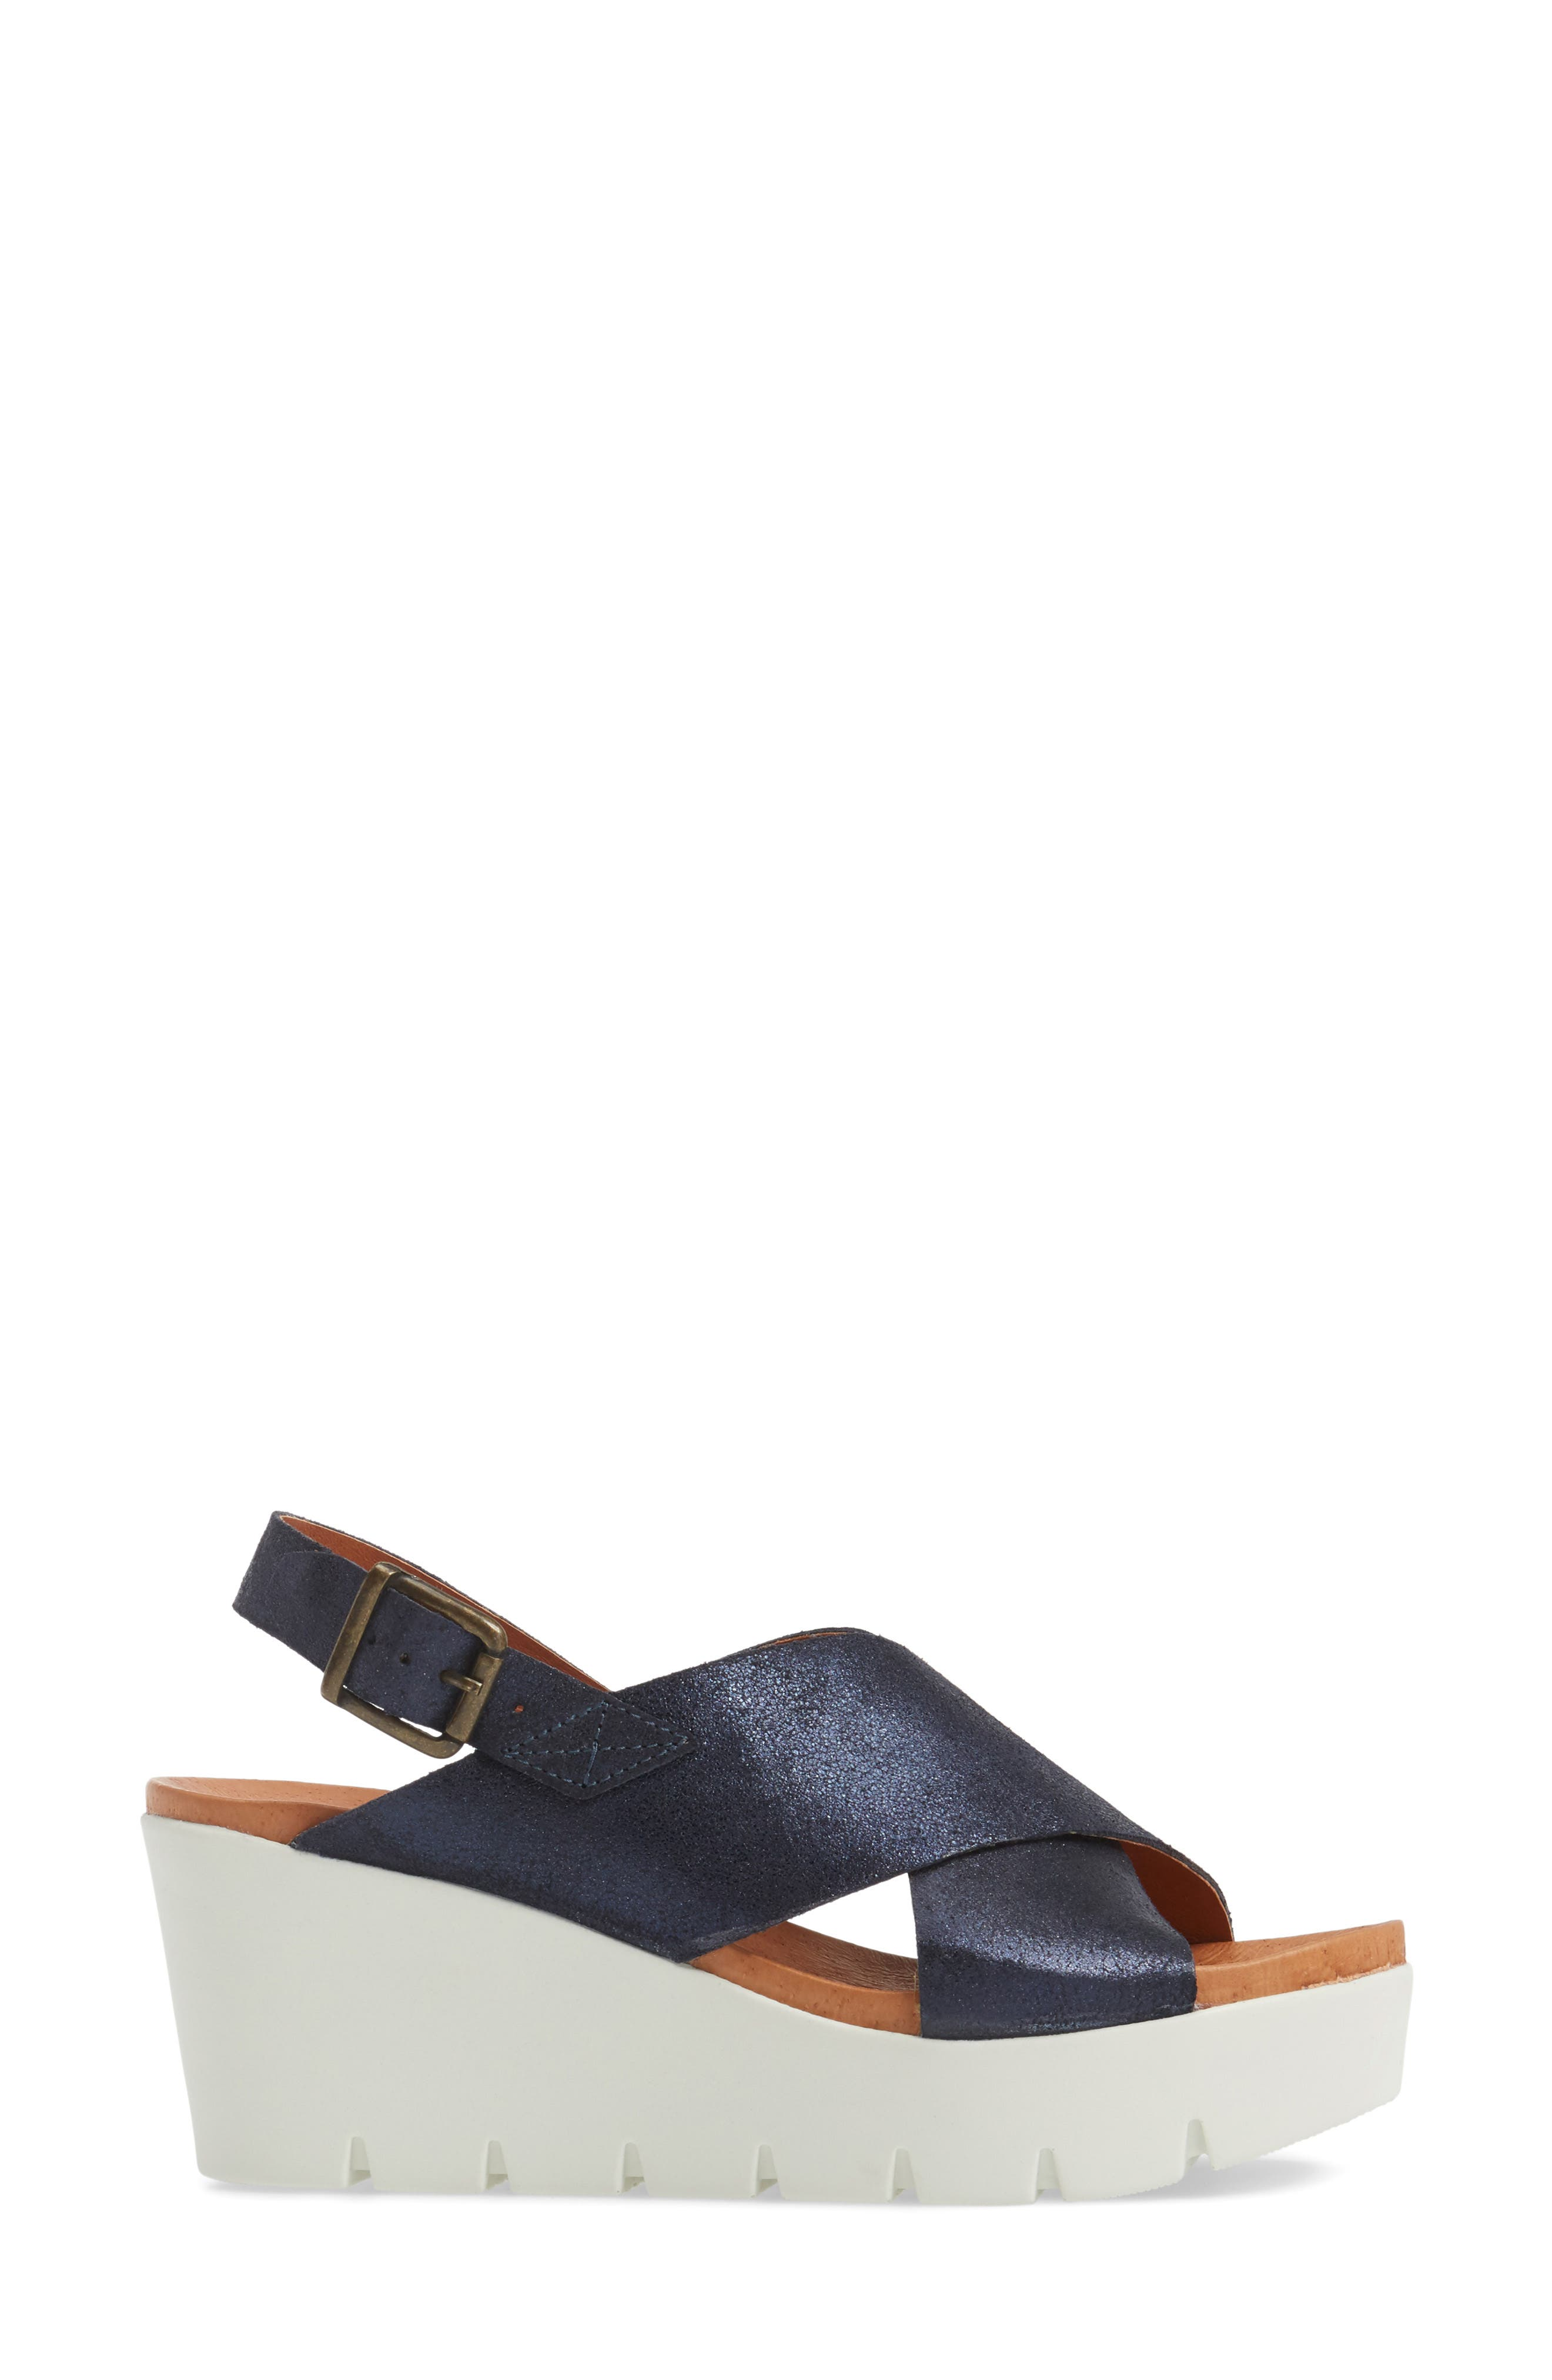 Payton Platform Wedge Sandal,                             Alternate thumbnail 3, color,                             Navy Glitter Suede